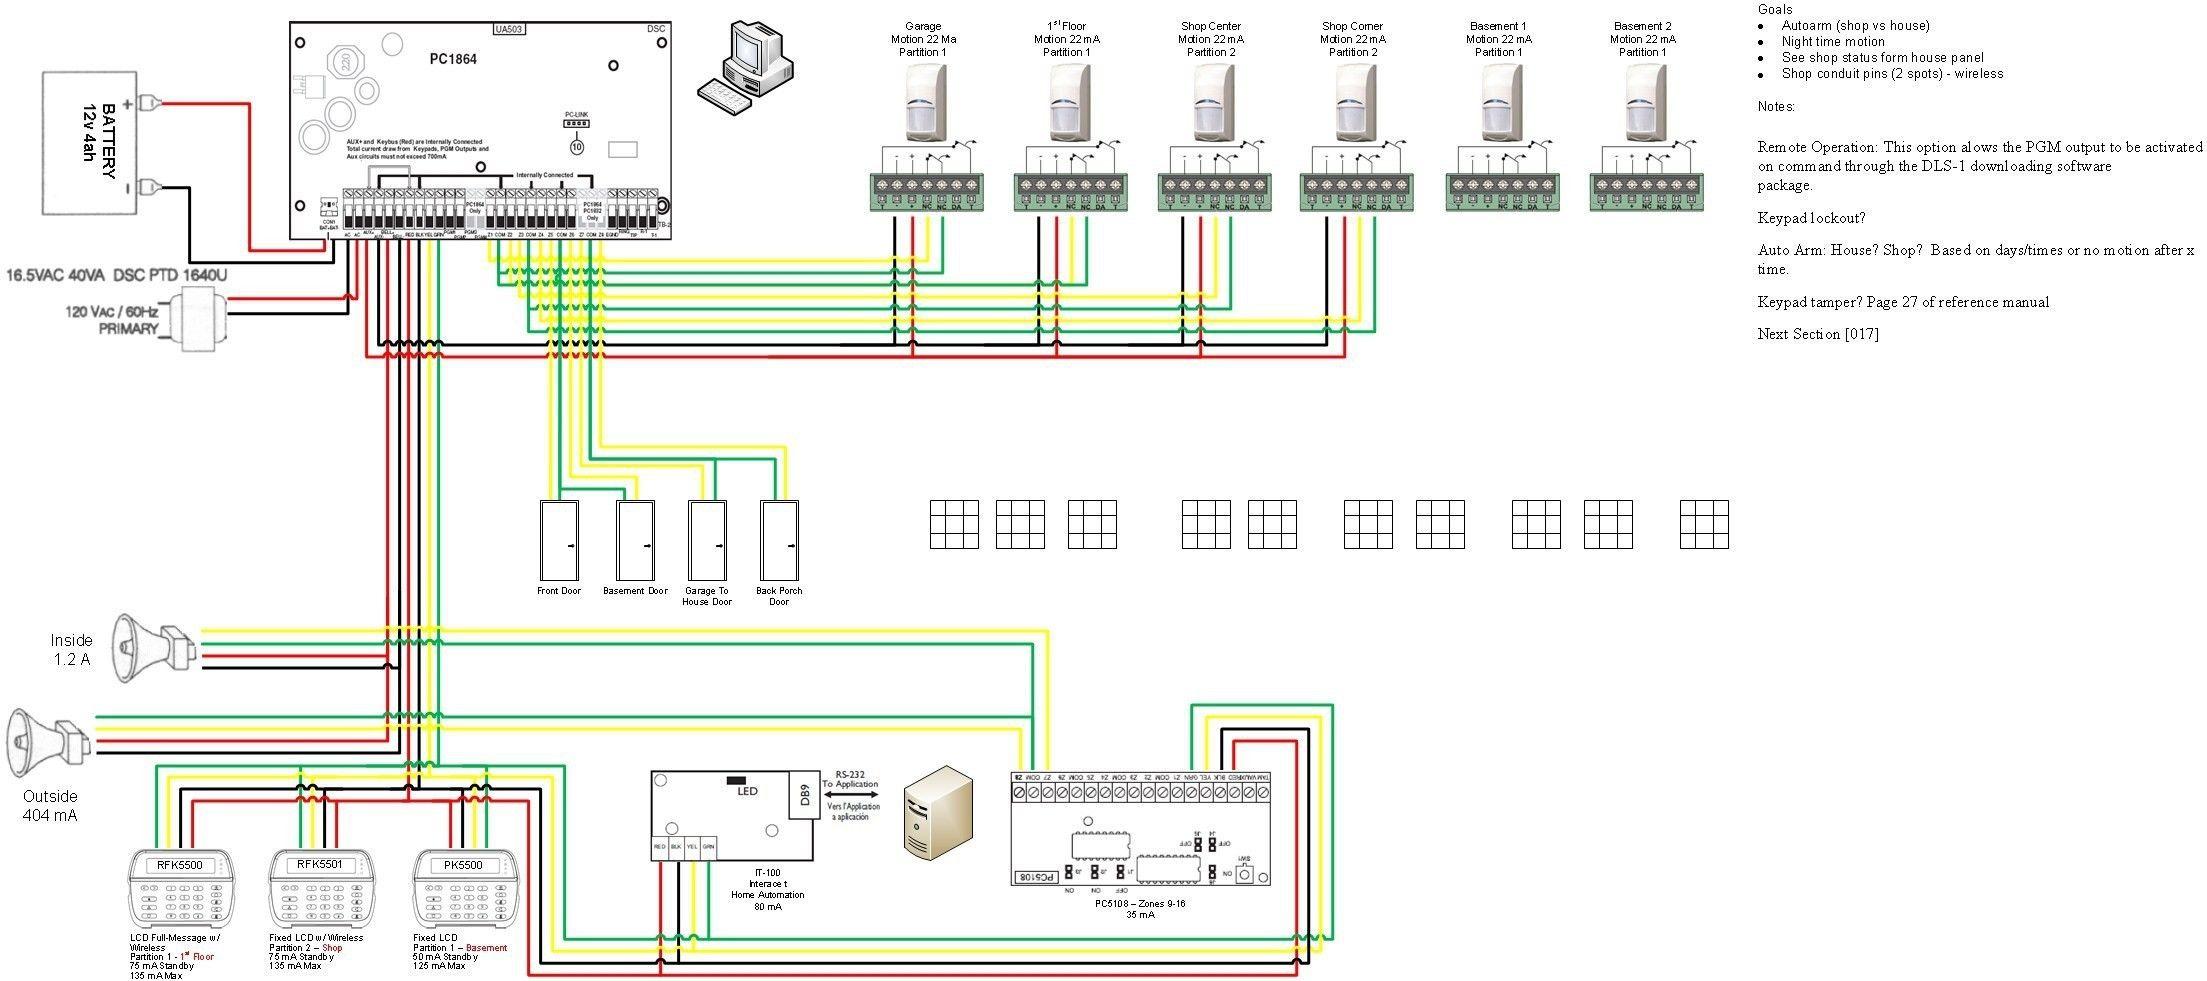 Viper 5305v Wiring Diagram Unique In 2020 Home Security Systems Home Security Wireless Home Security Systems